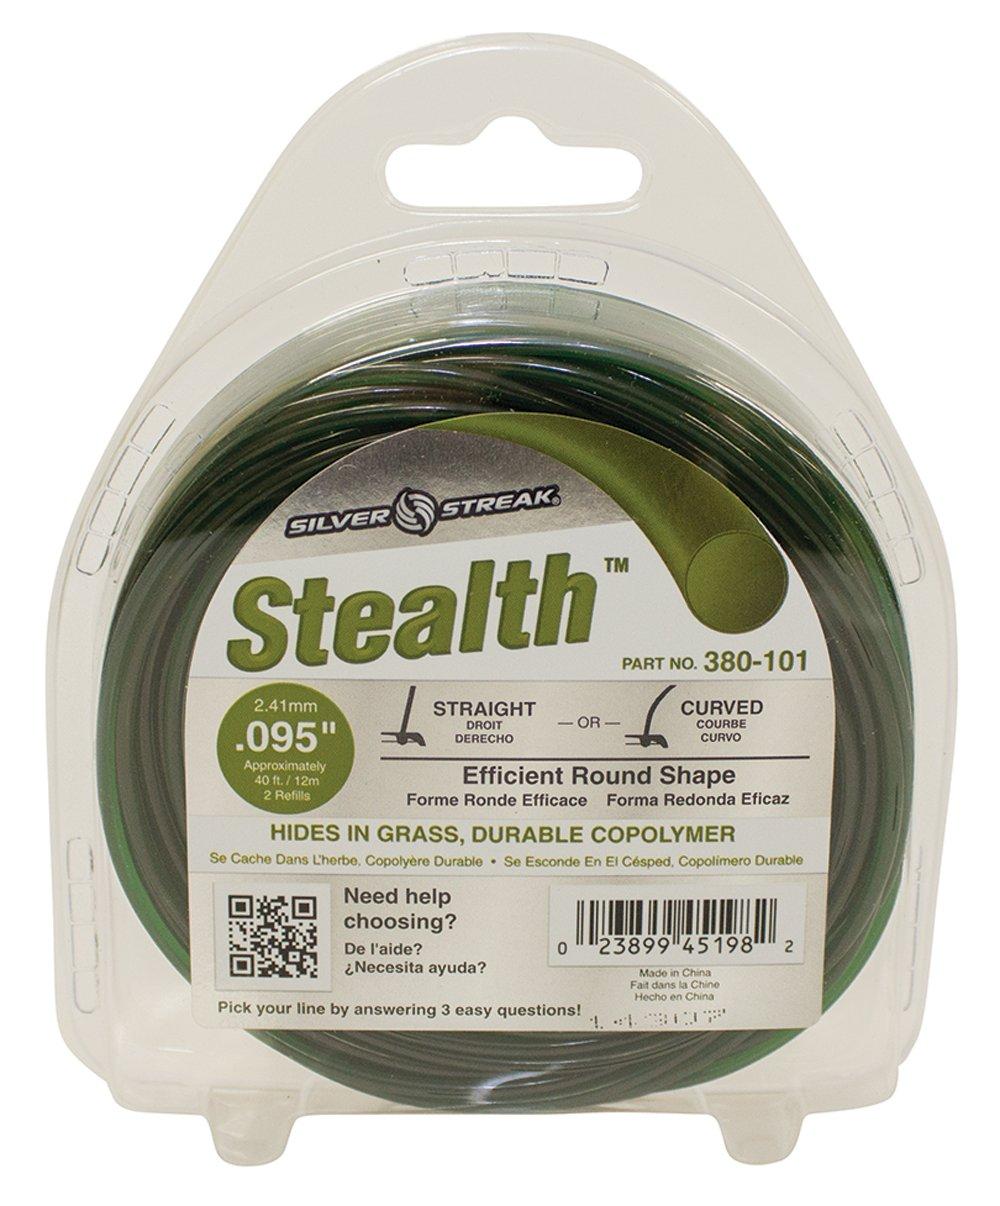 Stens 380-101 Stealth Trimmer Line